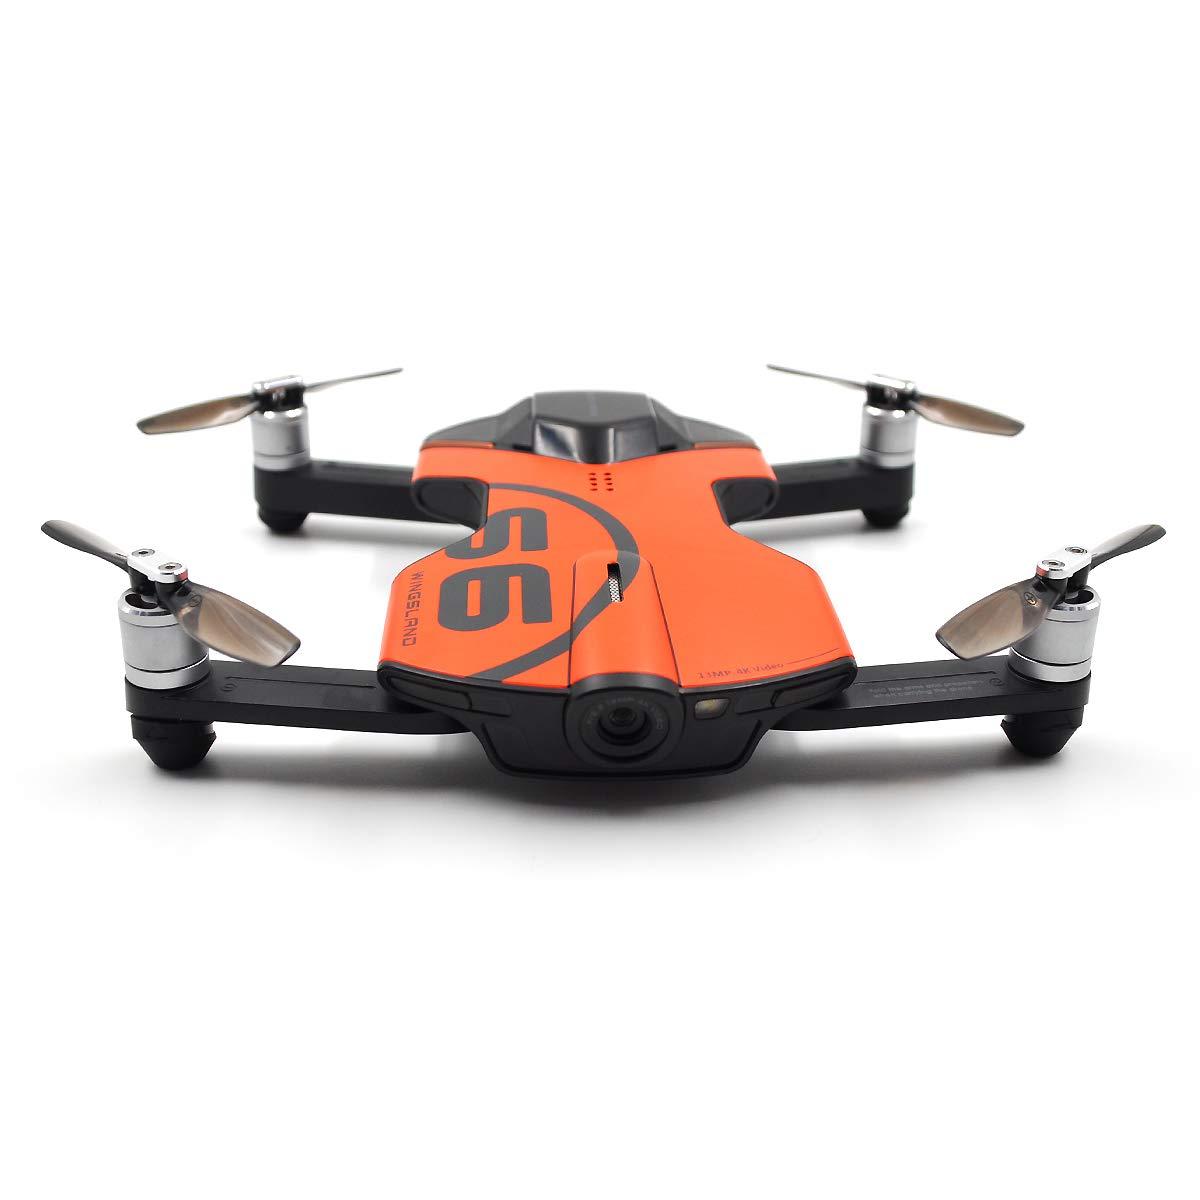 Ocamo Drone de Bolsillo, WiFi FPV y cámara 4K UHD para Evitar ...